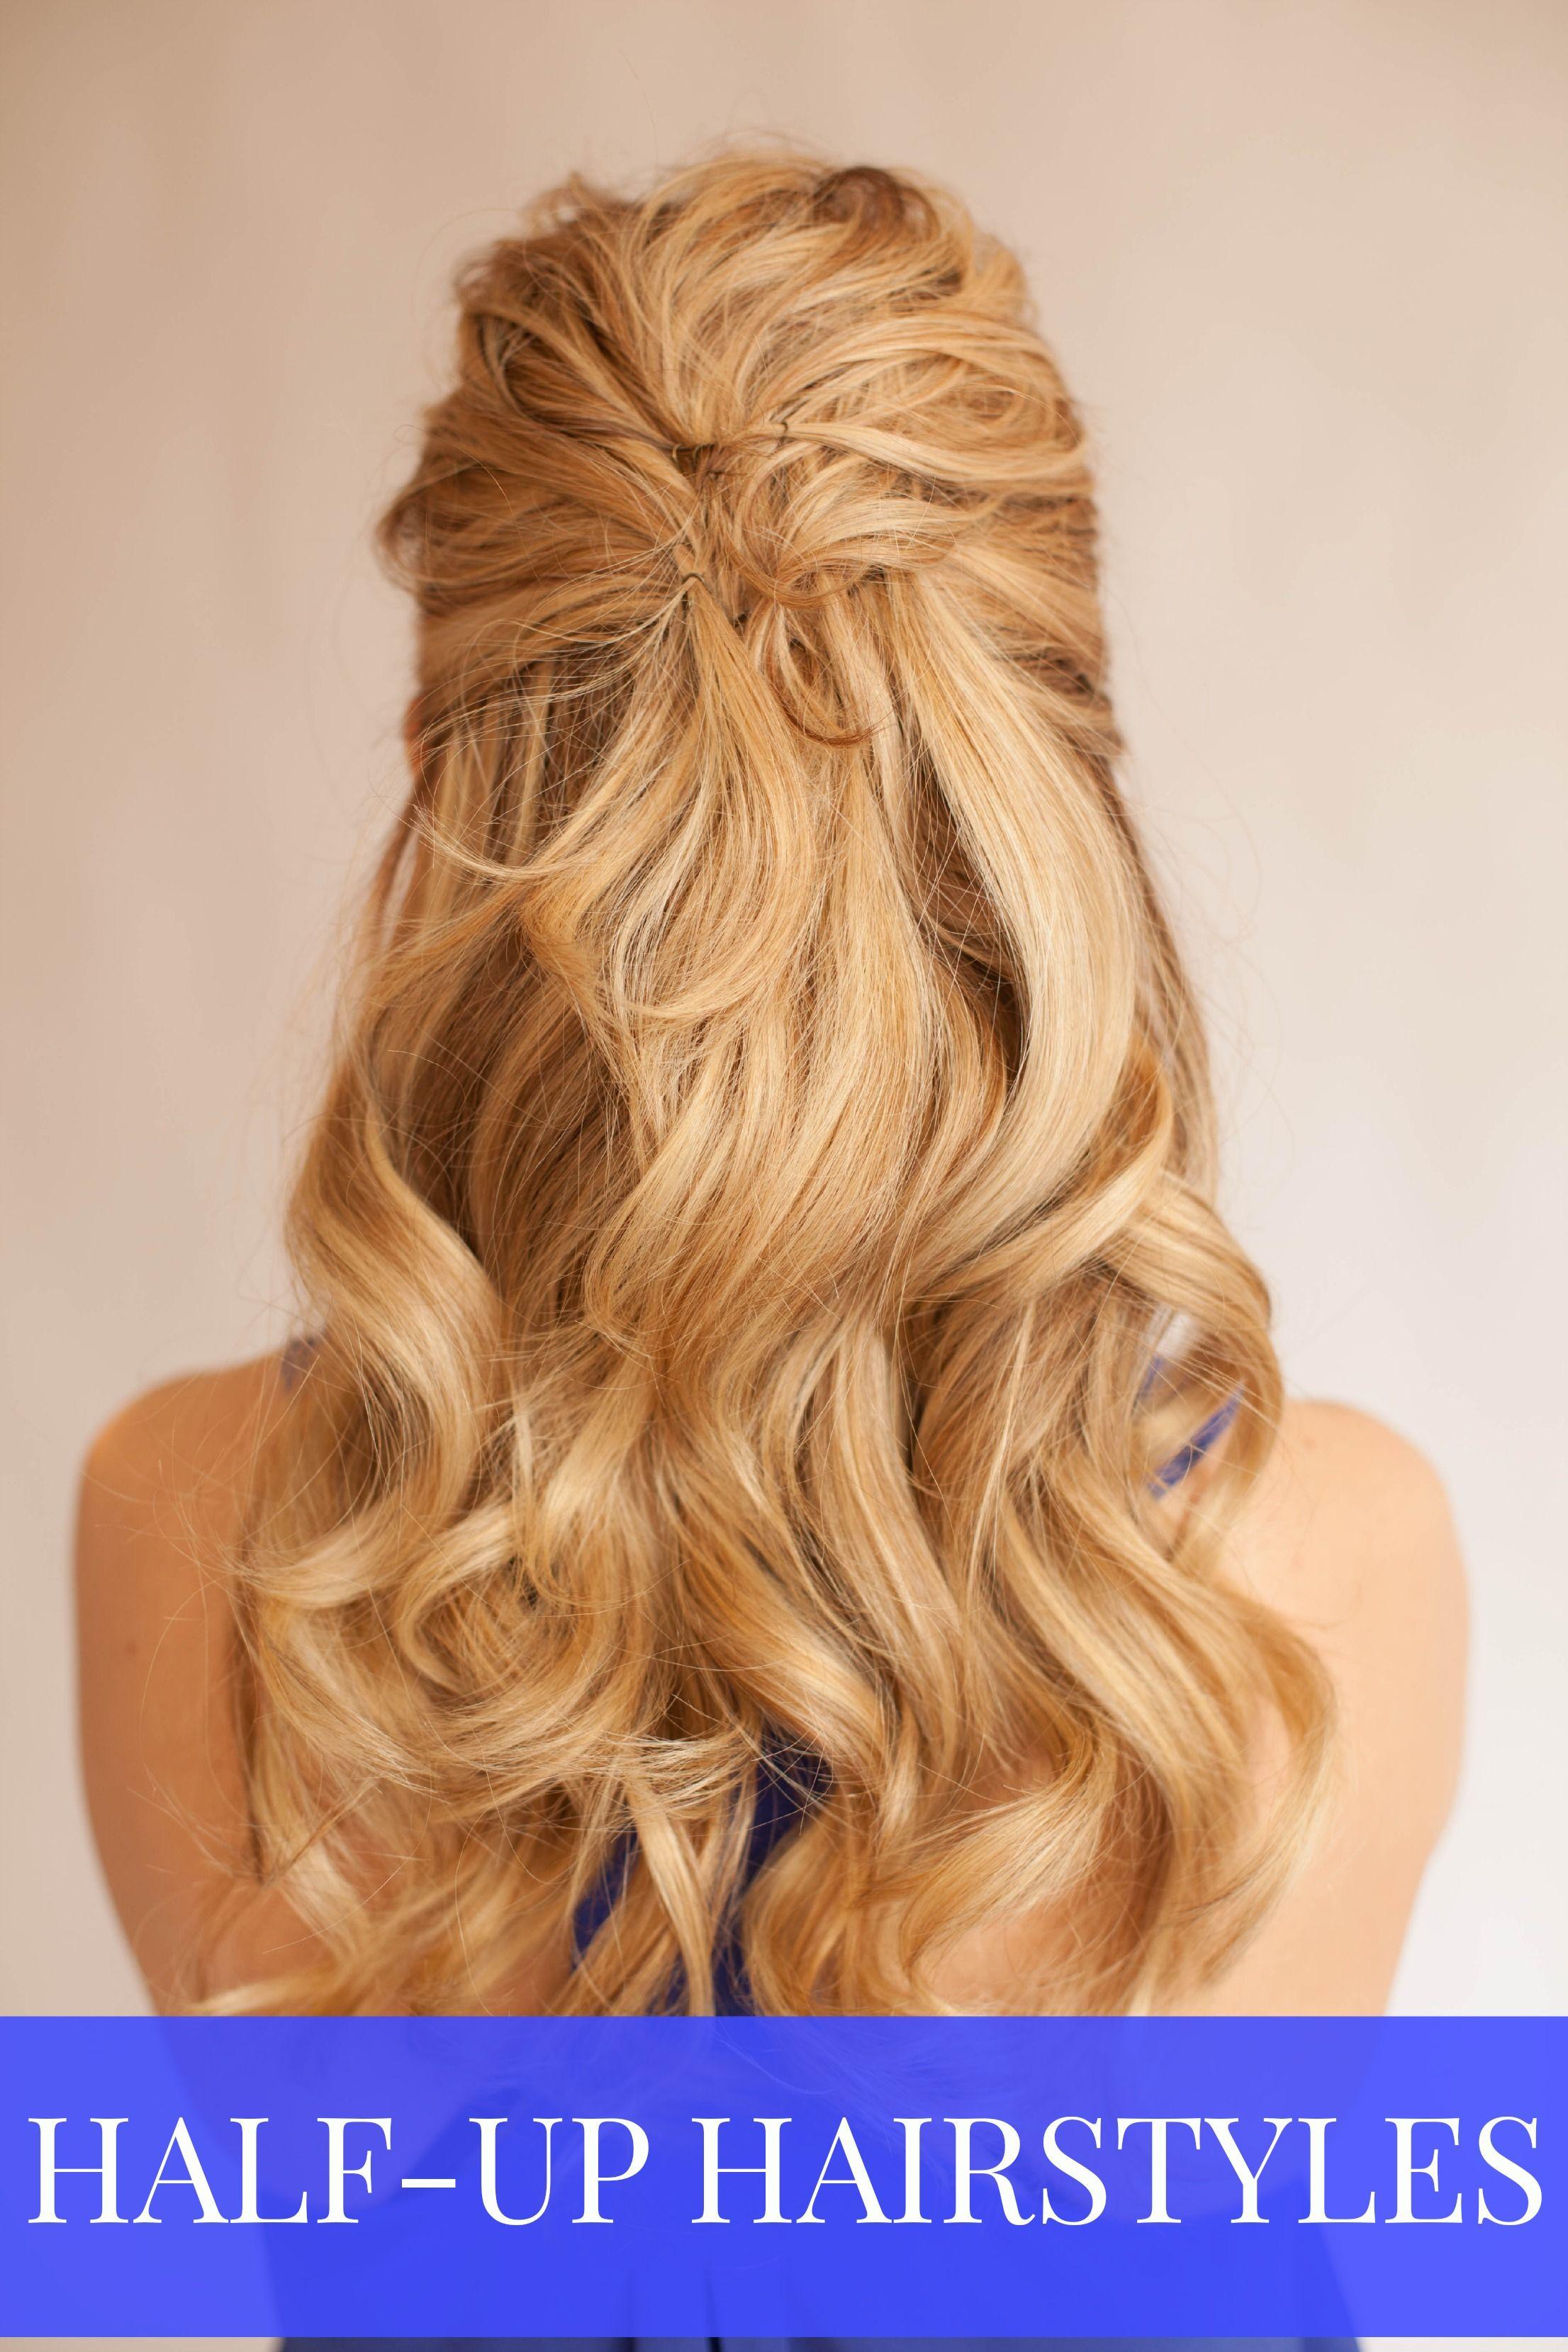 The Prettiest Half Up Half Down Wedding Hairstyles We've Ever Seen advise